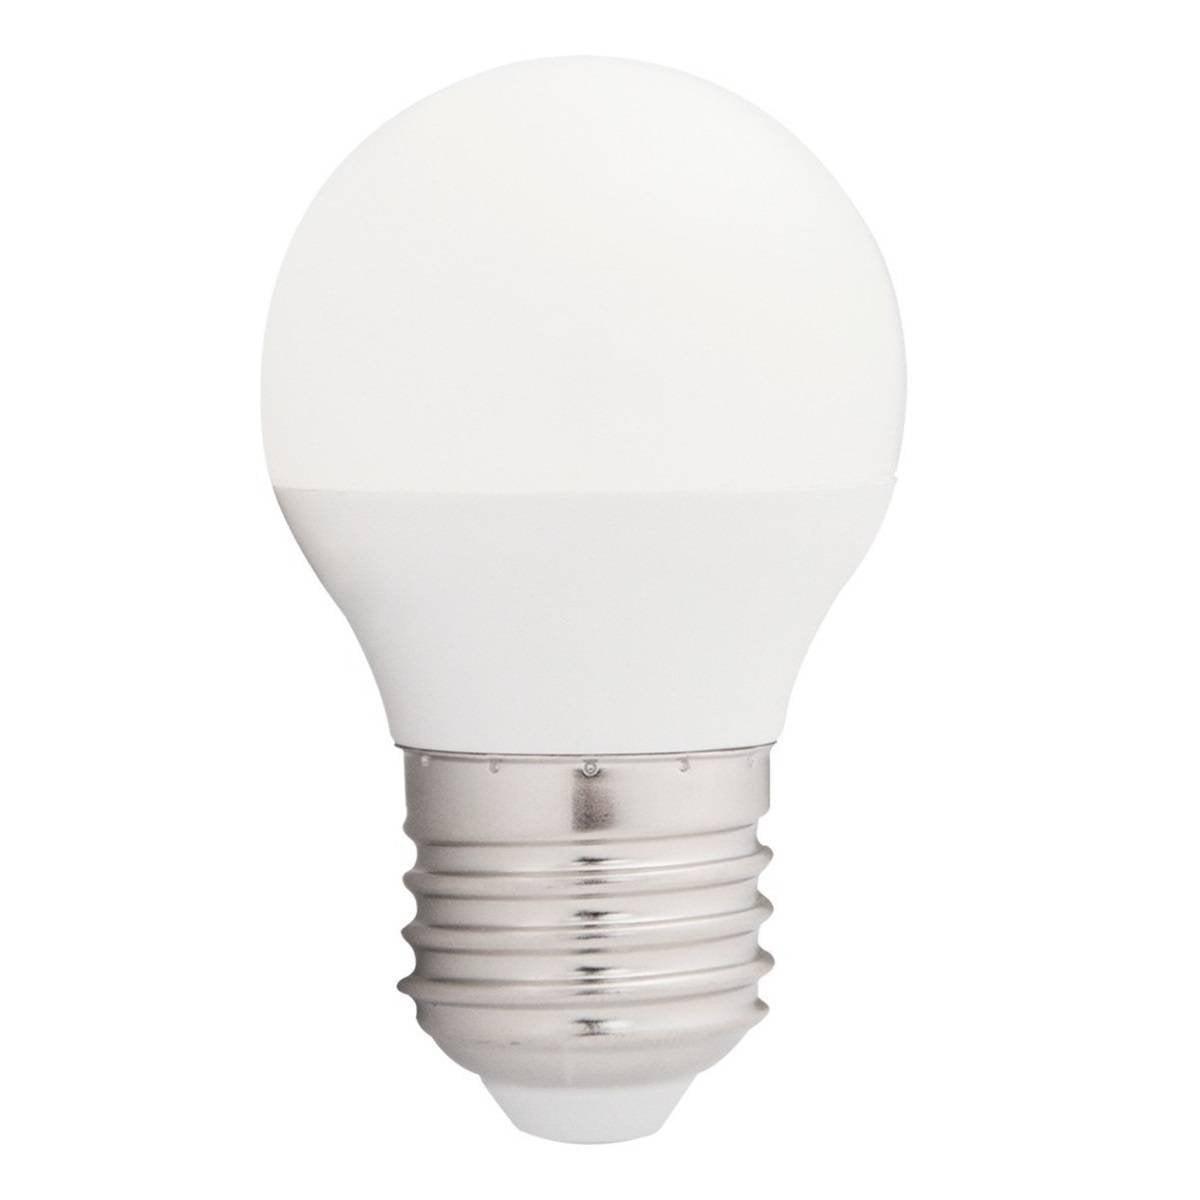 LAMPADA BOLINHA LED 4W 350LM 6500K BRANCO FRIO BIVOLT